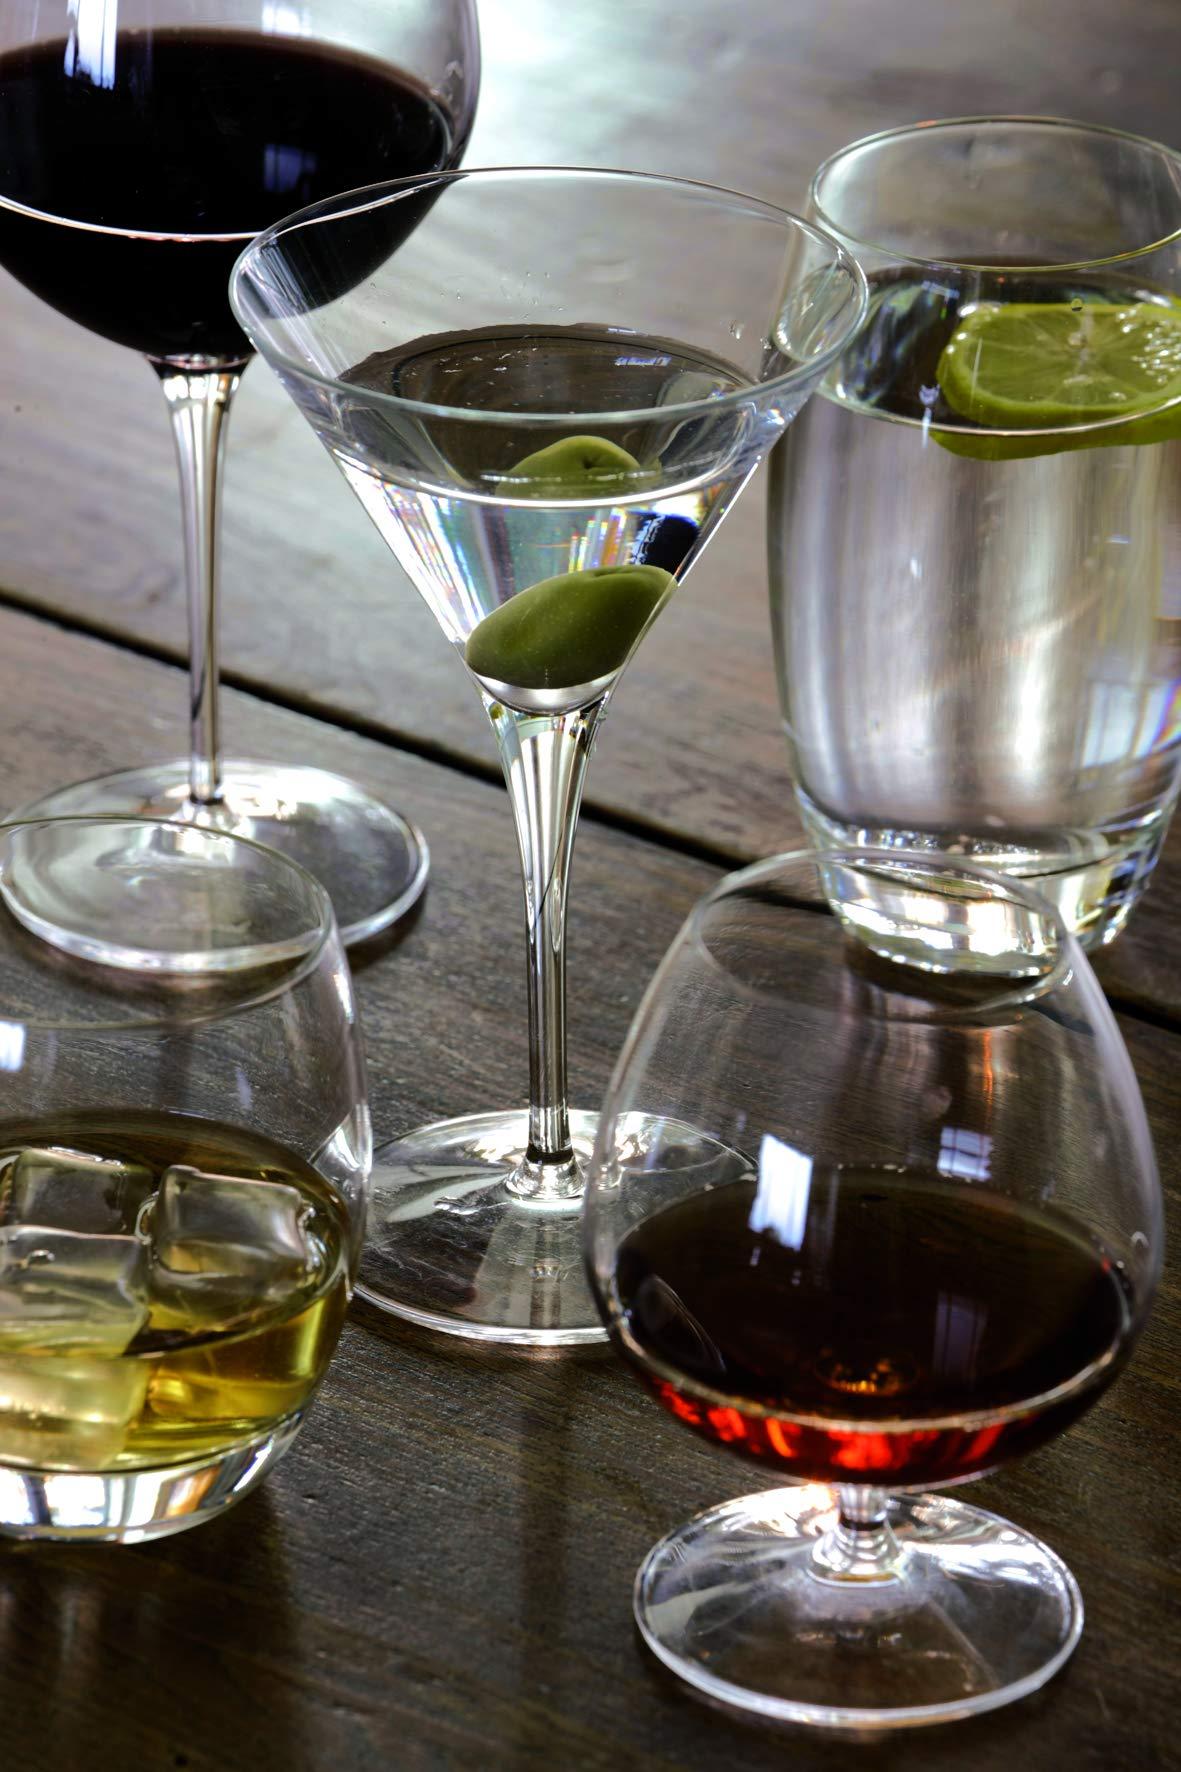 Luigi Bormioli Vinoteque 15.75 oz Cognac/Brandy Glasses, Set of 6, Clear